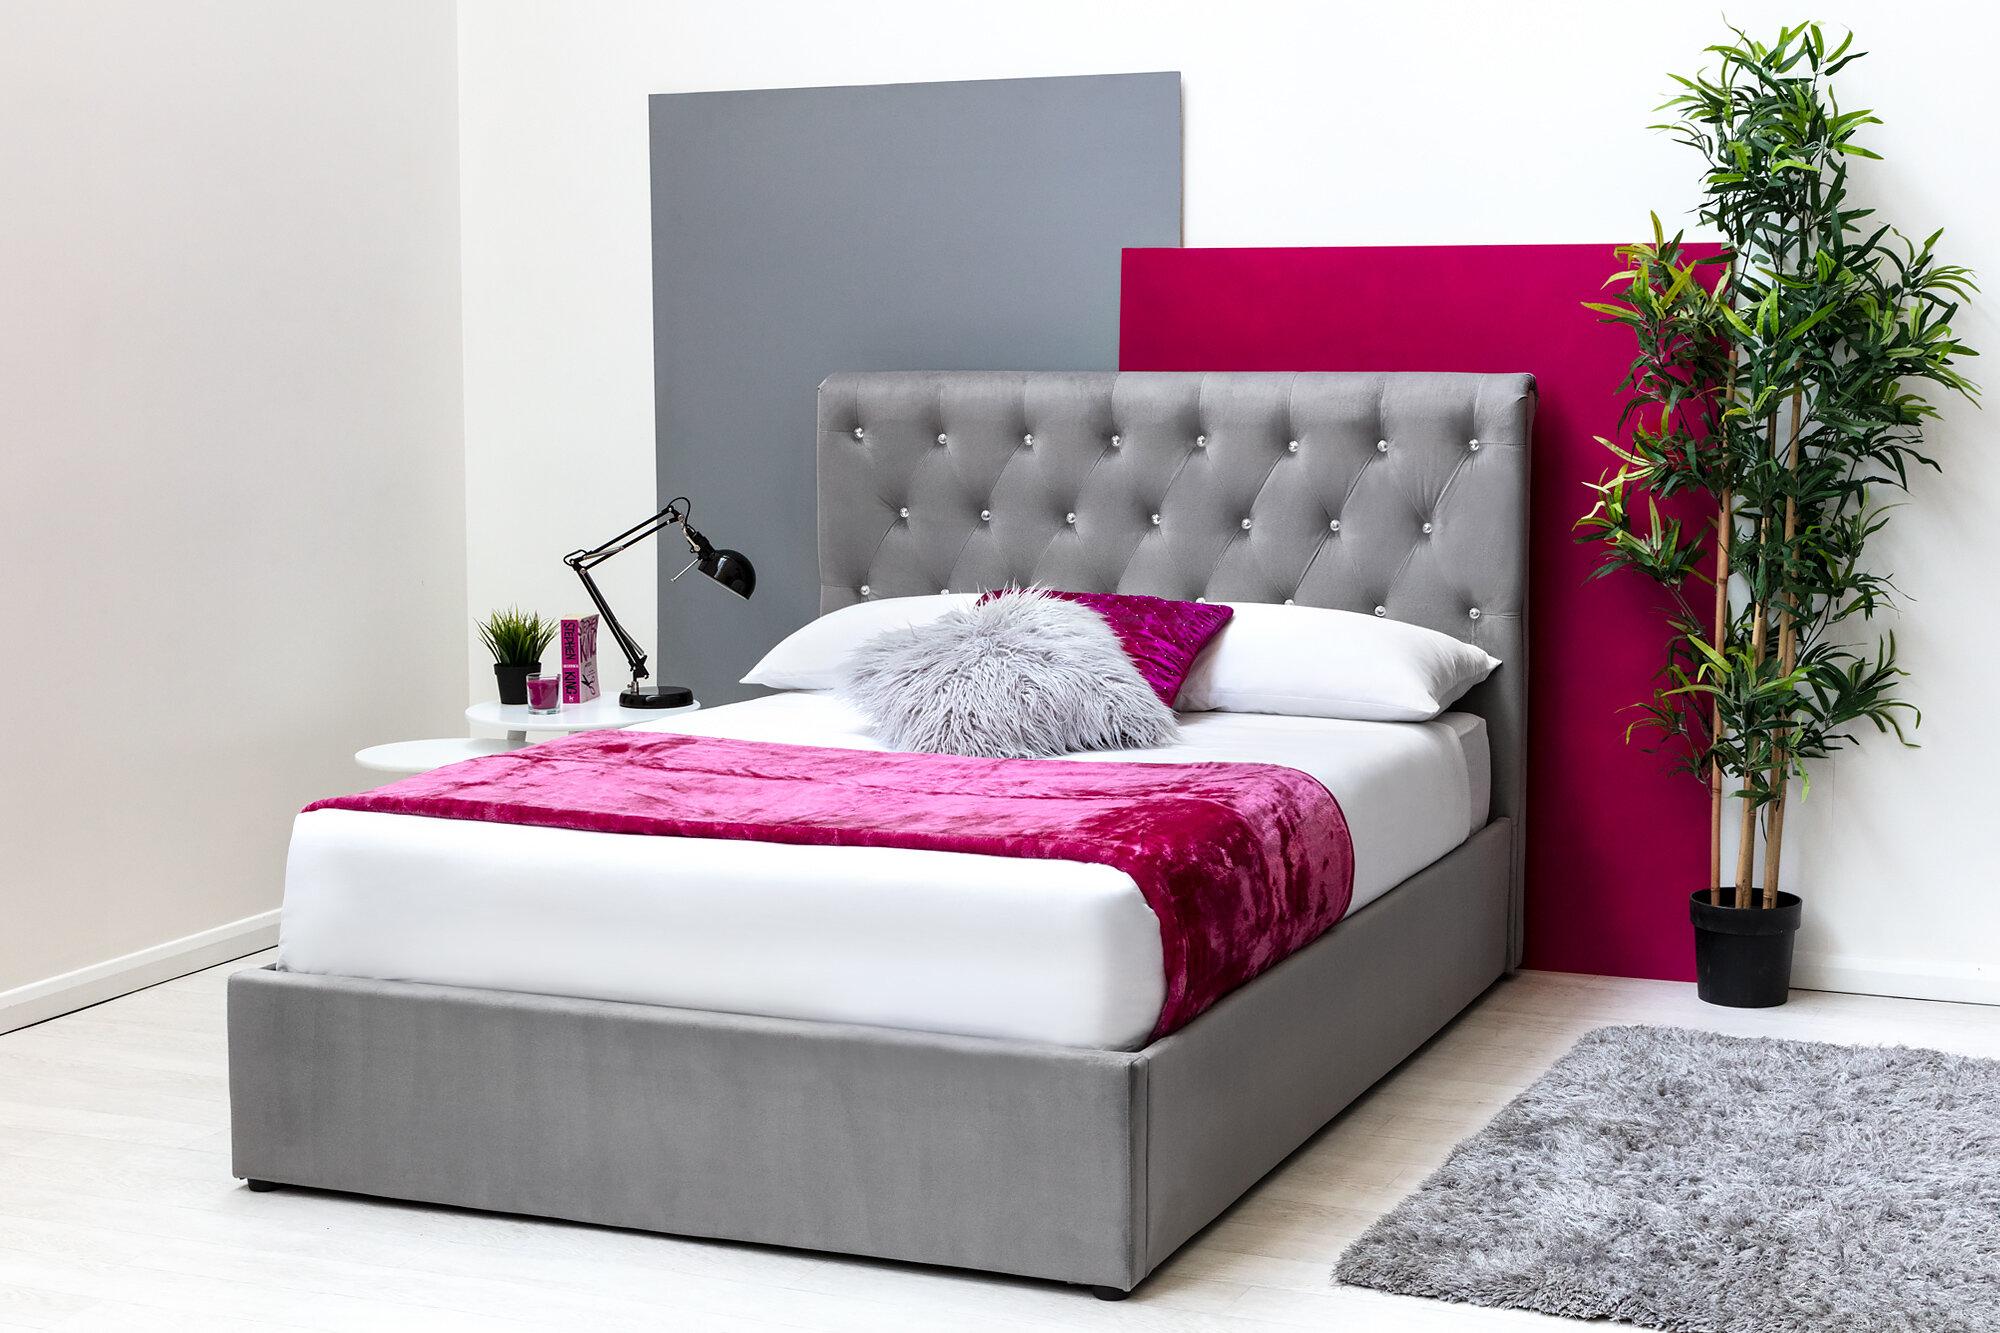 In Stock E4bc3 E0425 King Size Ottoman Bed With Mattress Nolataridobermans Co Uk